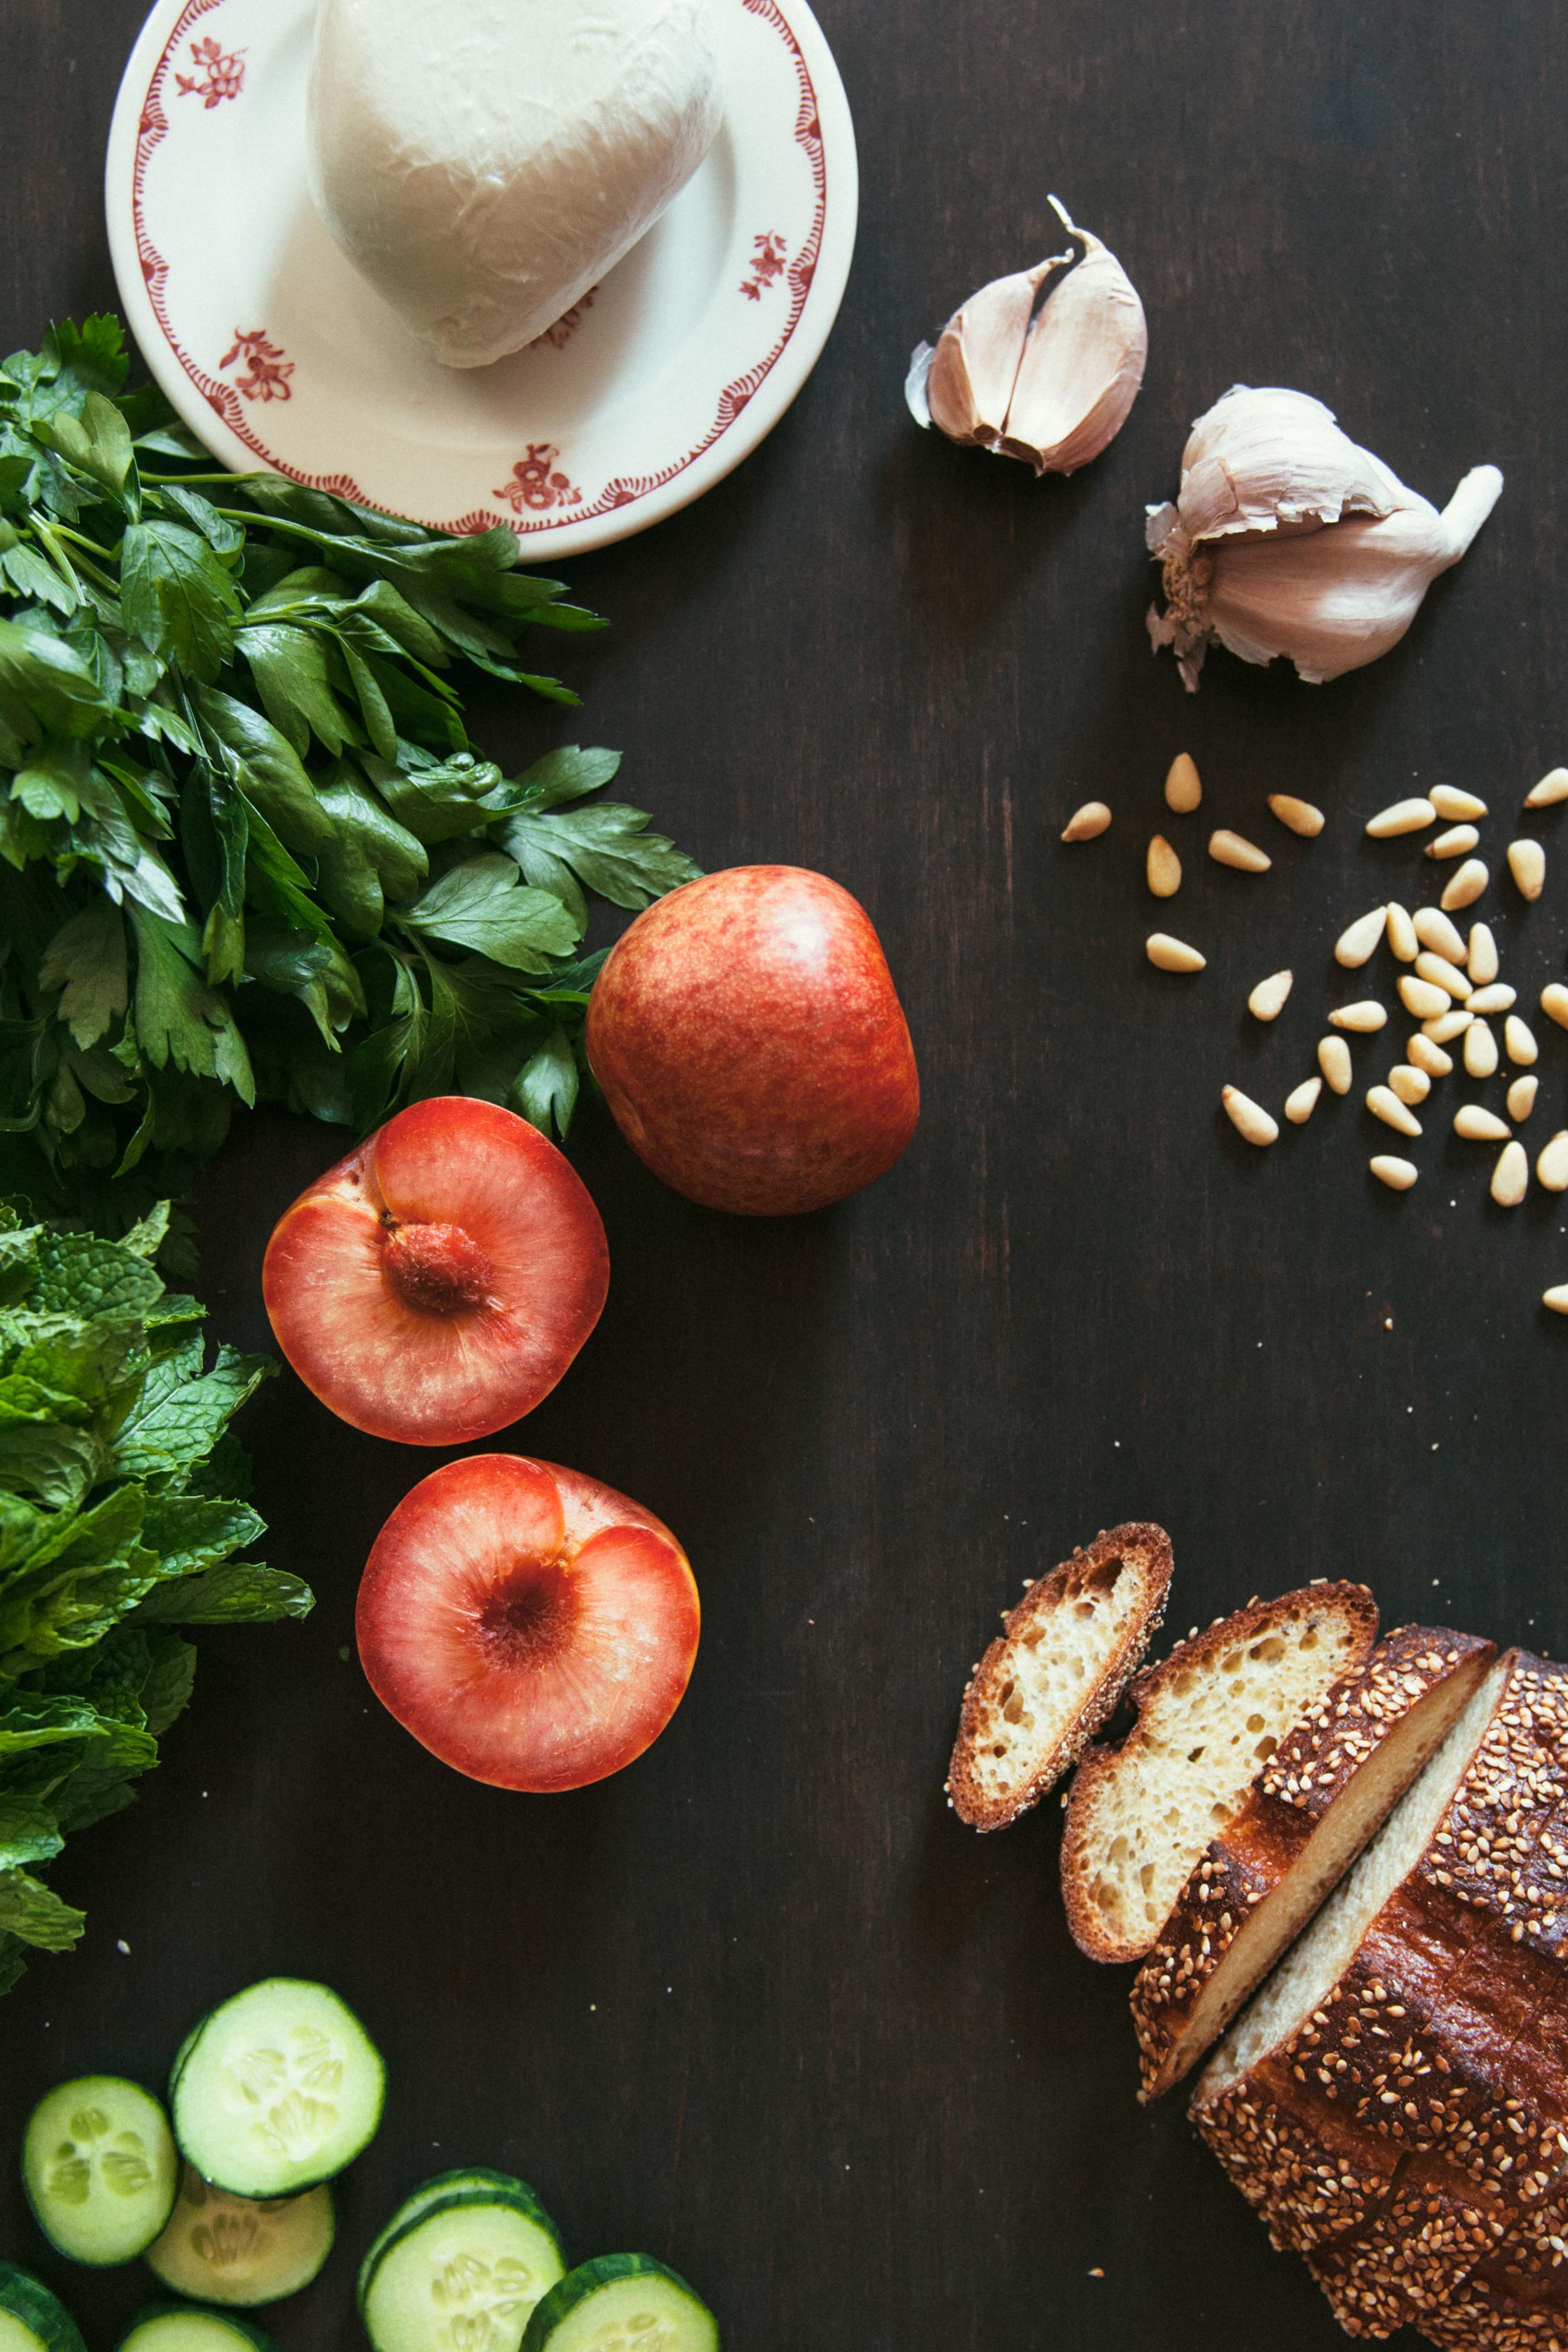 mozzarella_pluot_salad2.jpg